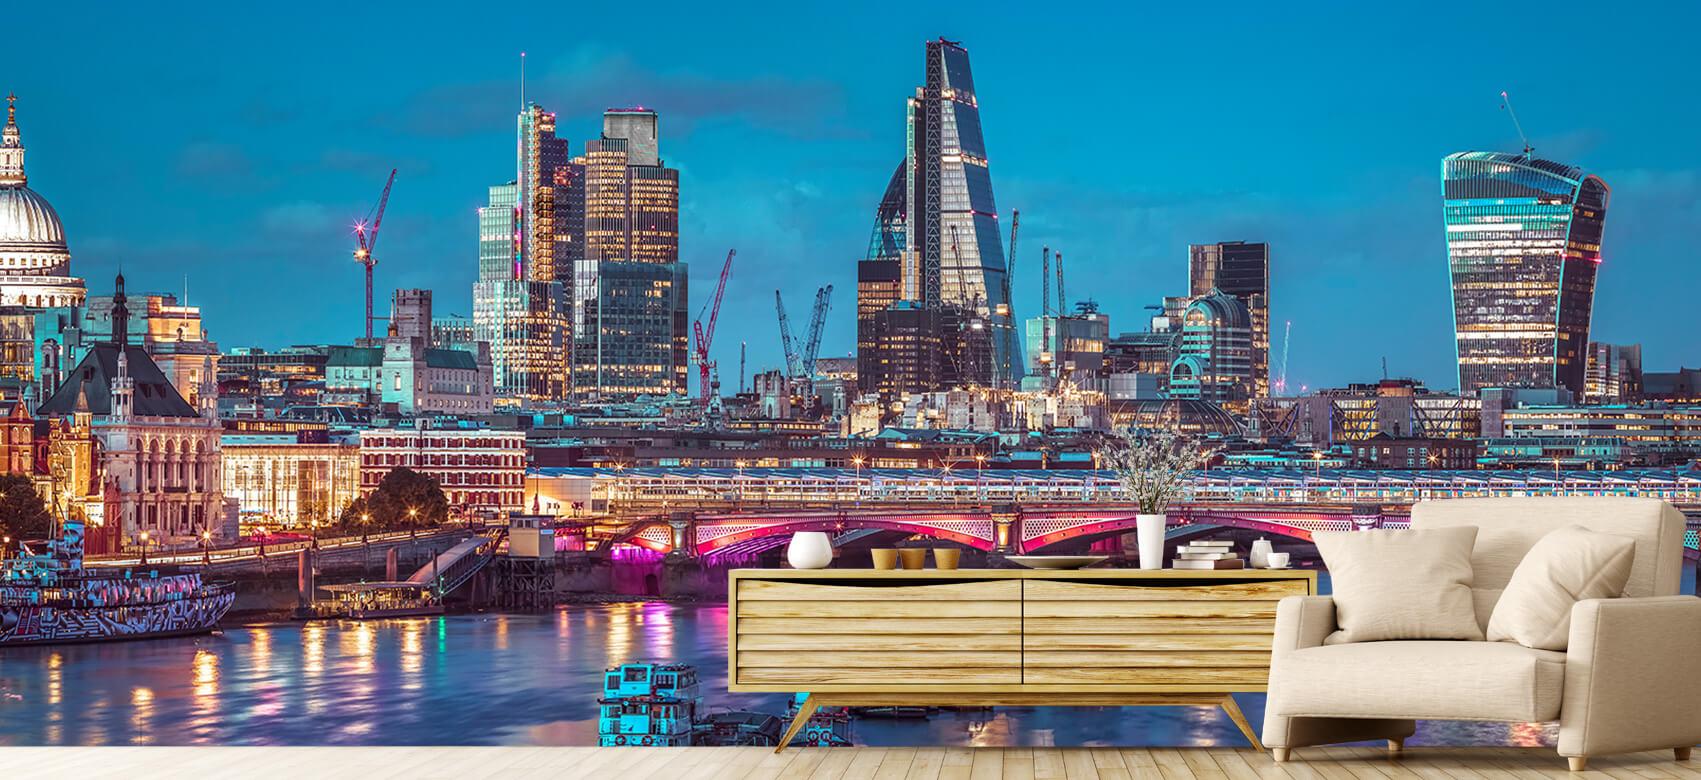 Blackfriars Bridge i London 4